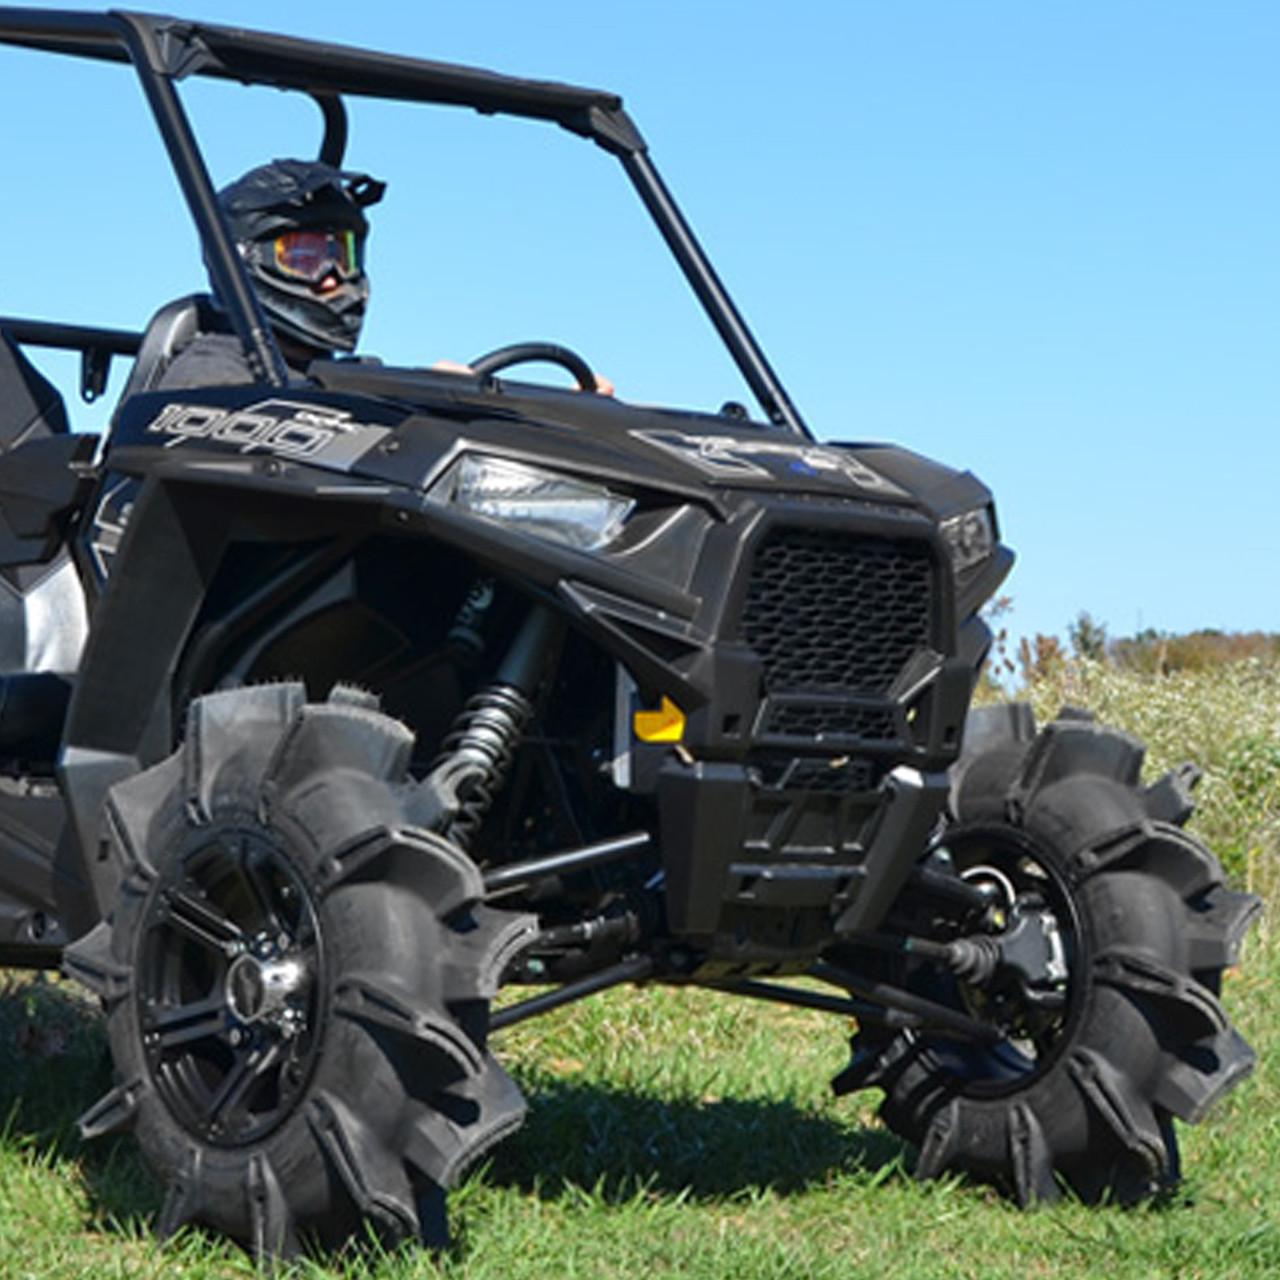 Motohavok Efx Tires Performance Utv Atv And Golf Cart >> Top 10 Punto Medio Noticias 37 Juggernaut Tires